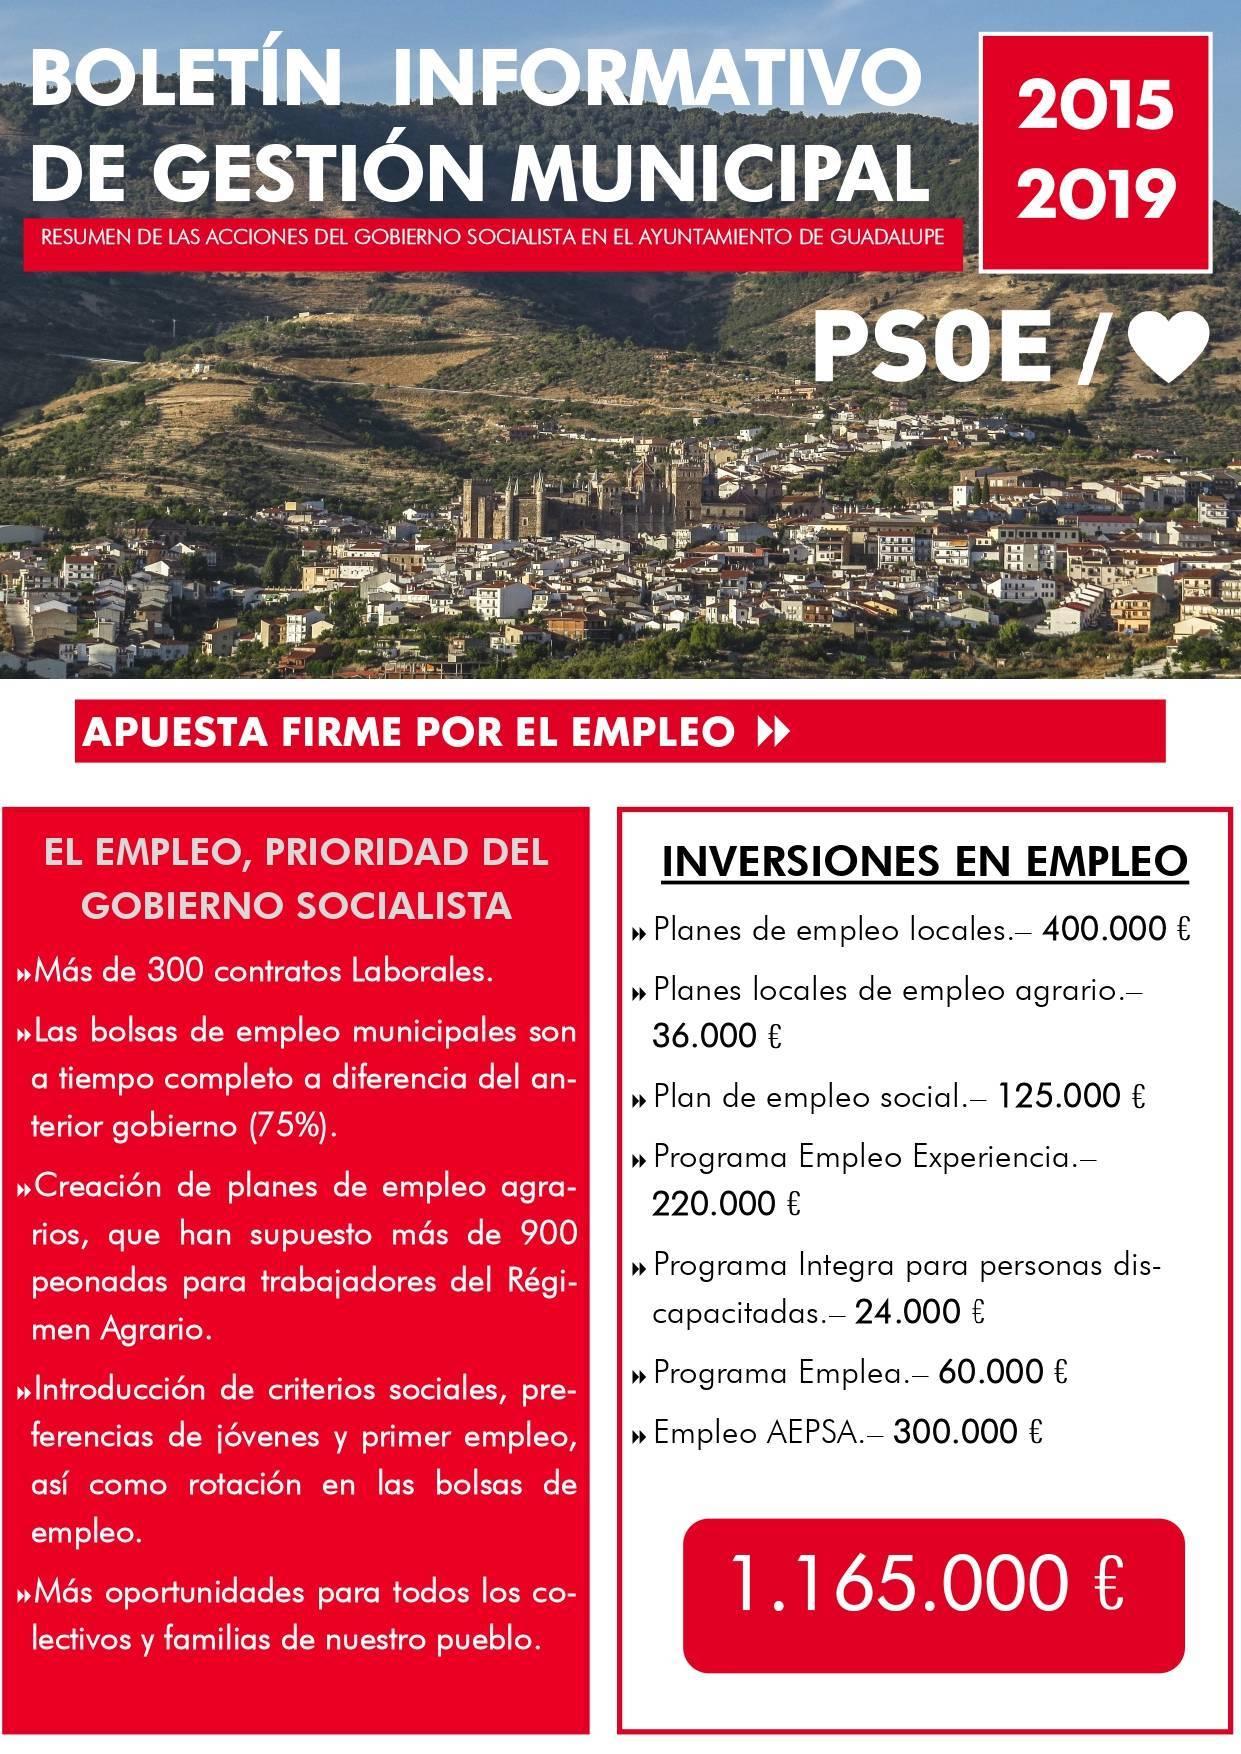 Boletín informativo de gestión municipal 2015-2019 - Guadalupe (Cáceres) 1